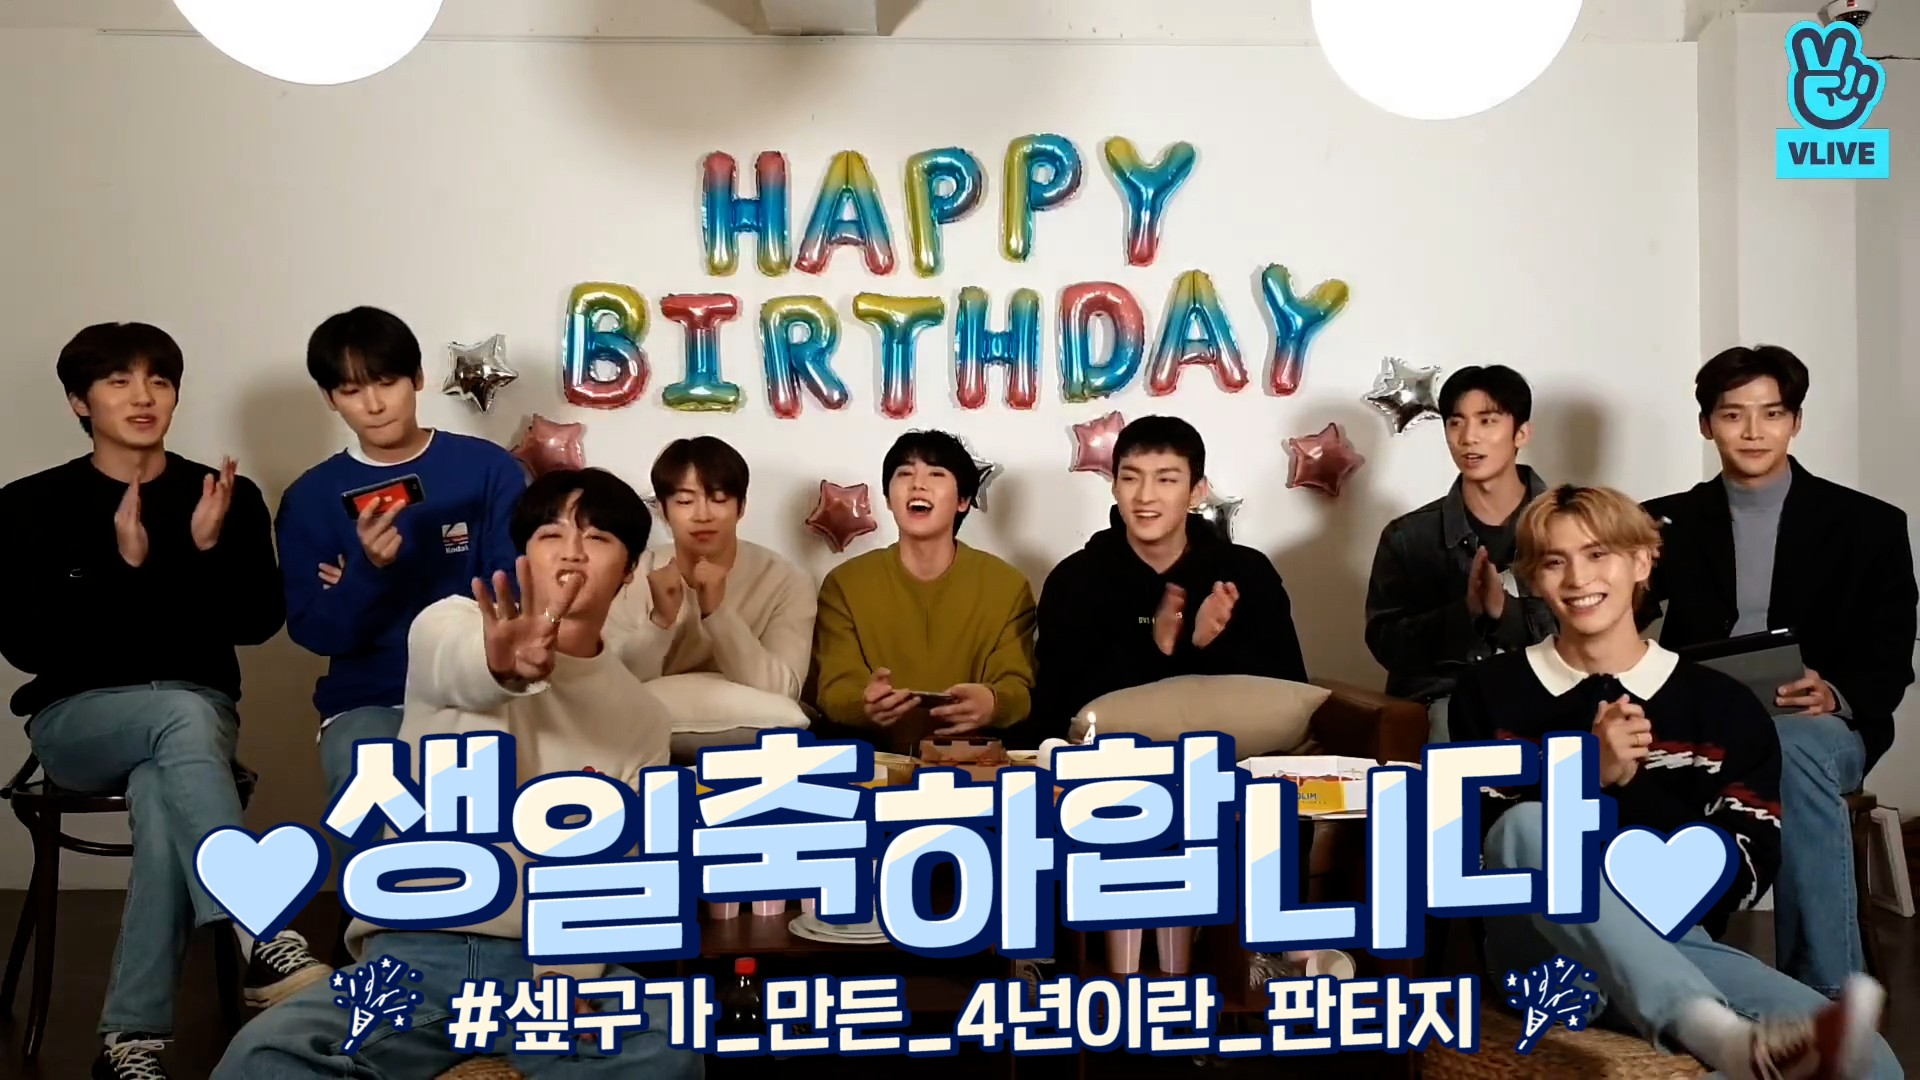 [SF9] (무)조건 제 (인)생의 (도)착점은 바로🏝️ 에스에프나인✨ (HAPPY SF9's 4th Anniversary)